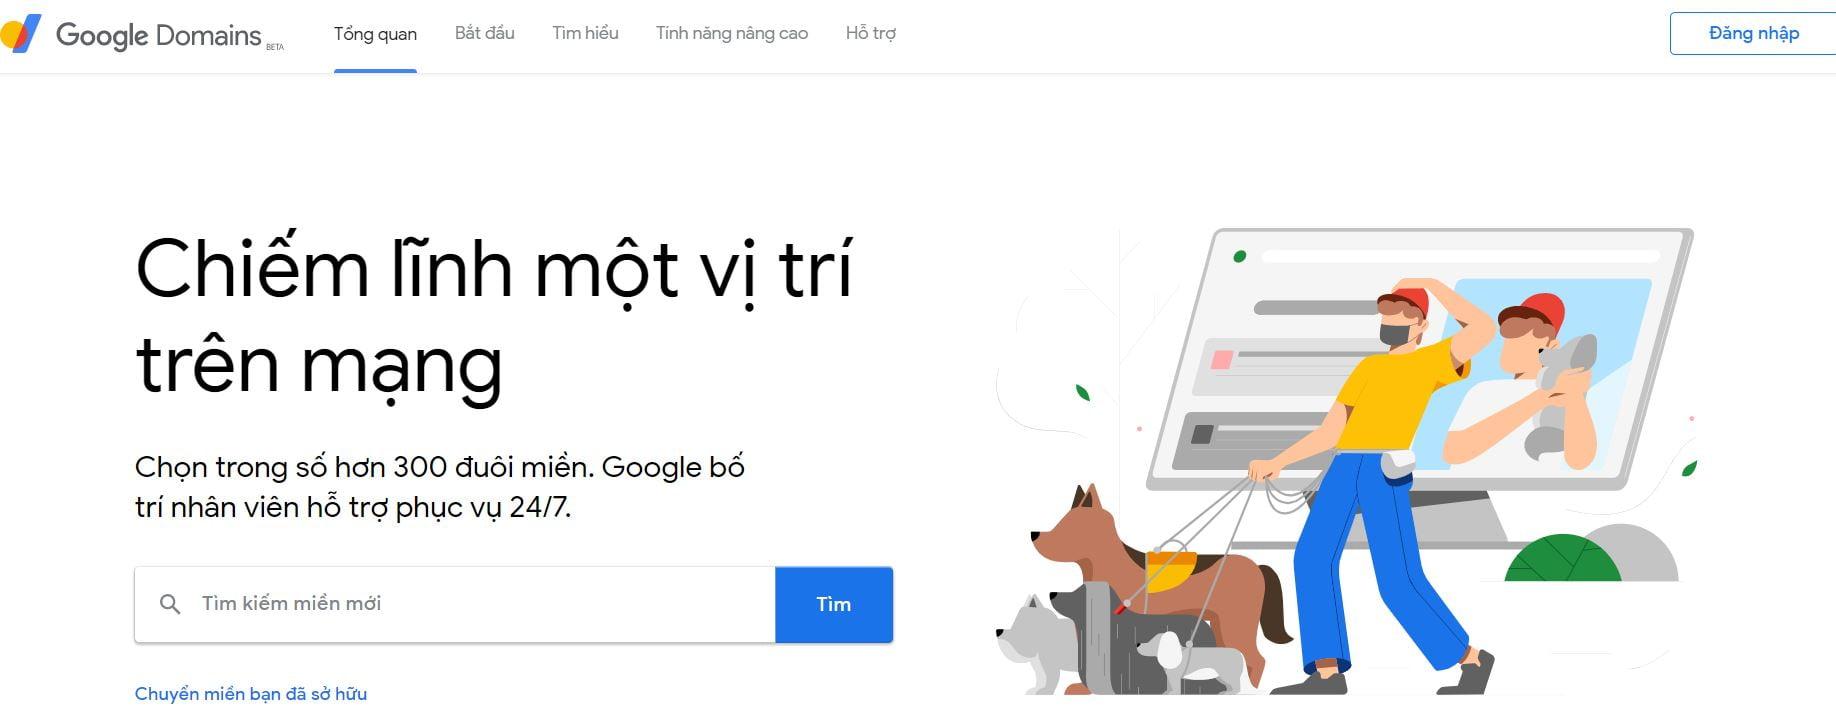 nha-cung-cap-dich-vu-ten-mien-google-domain